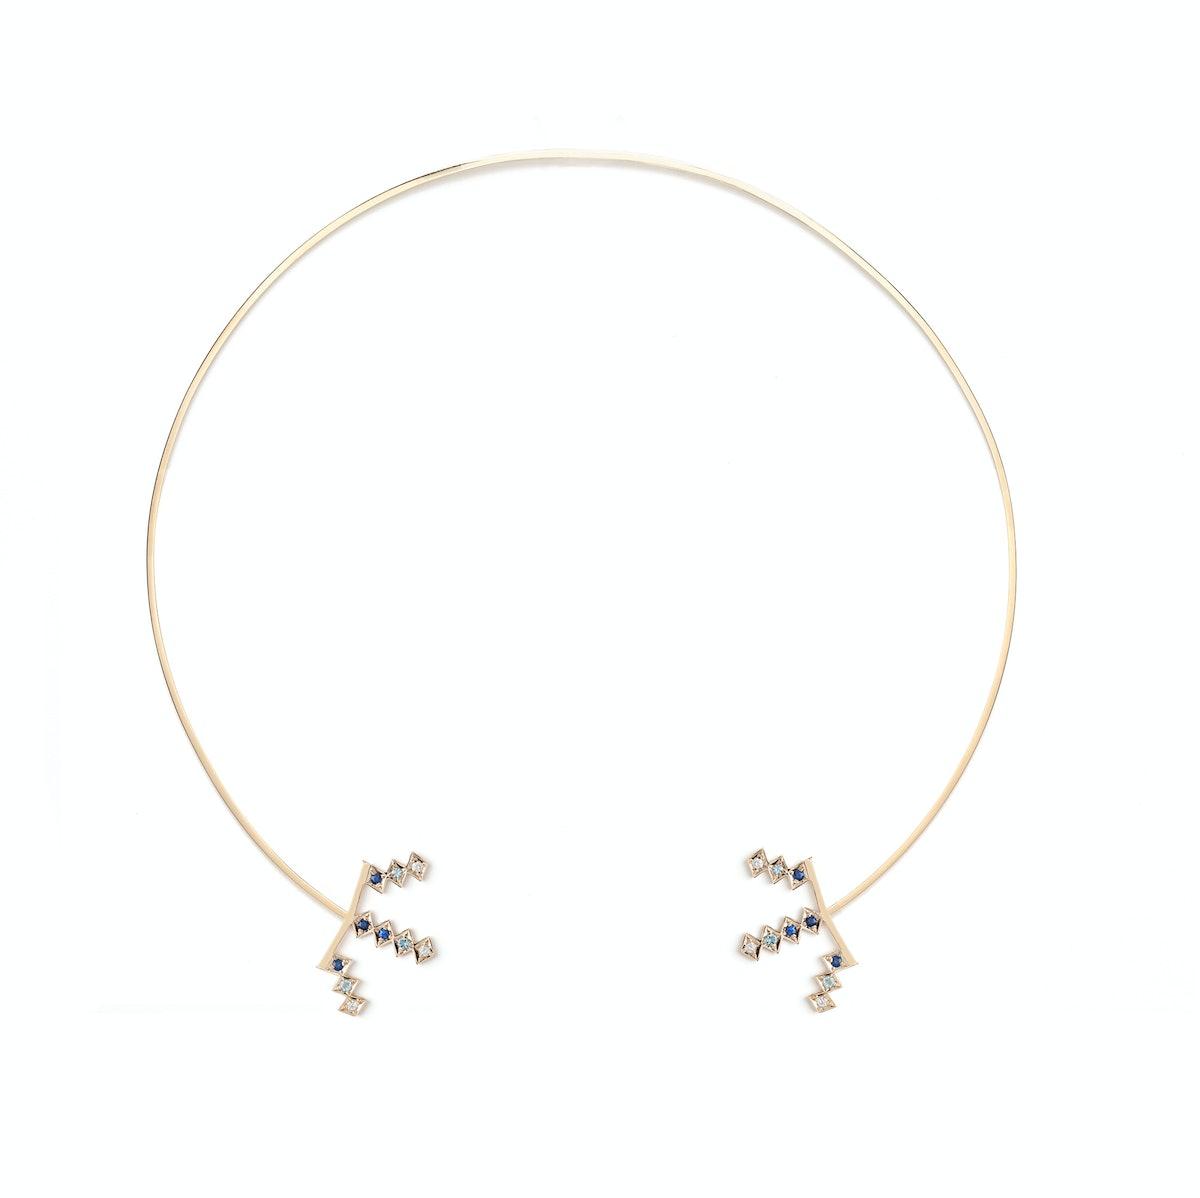 AZLEE 18k yellow gold, sapphire, and diamond collar necklace